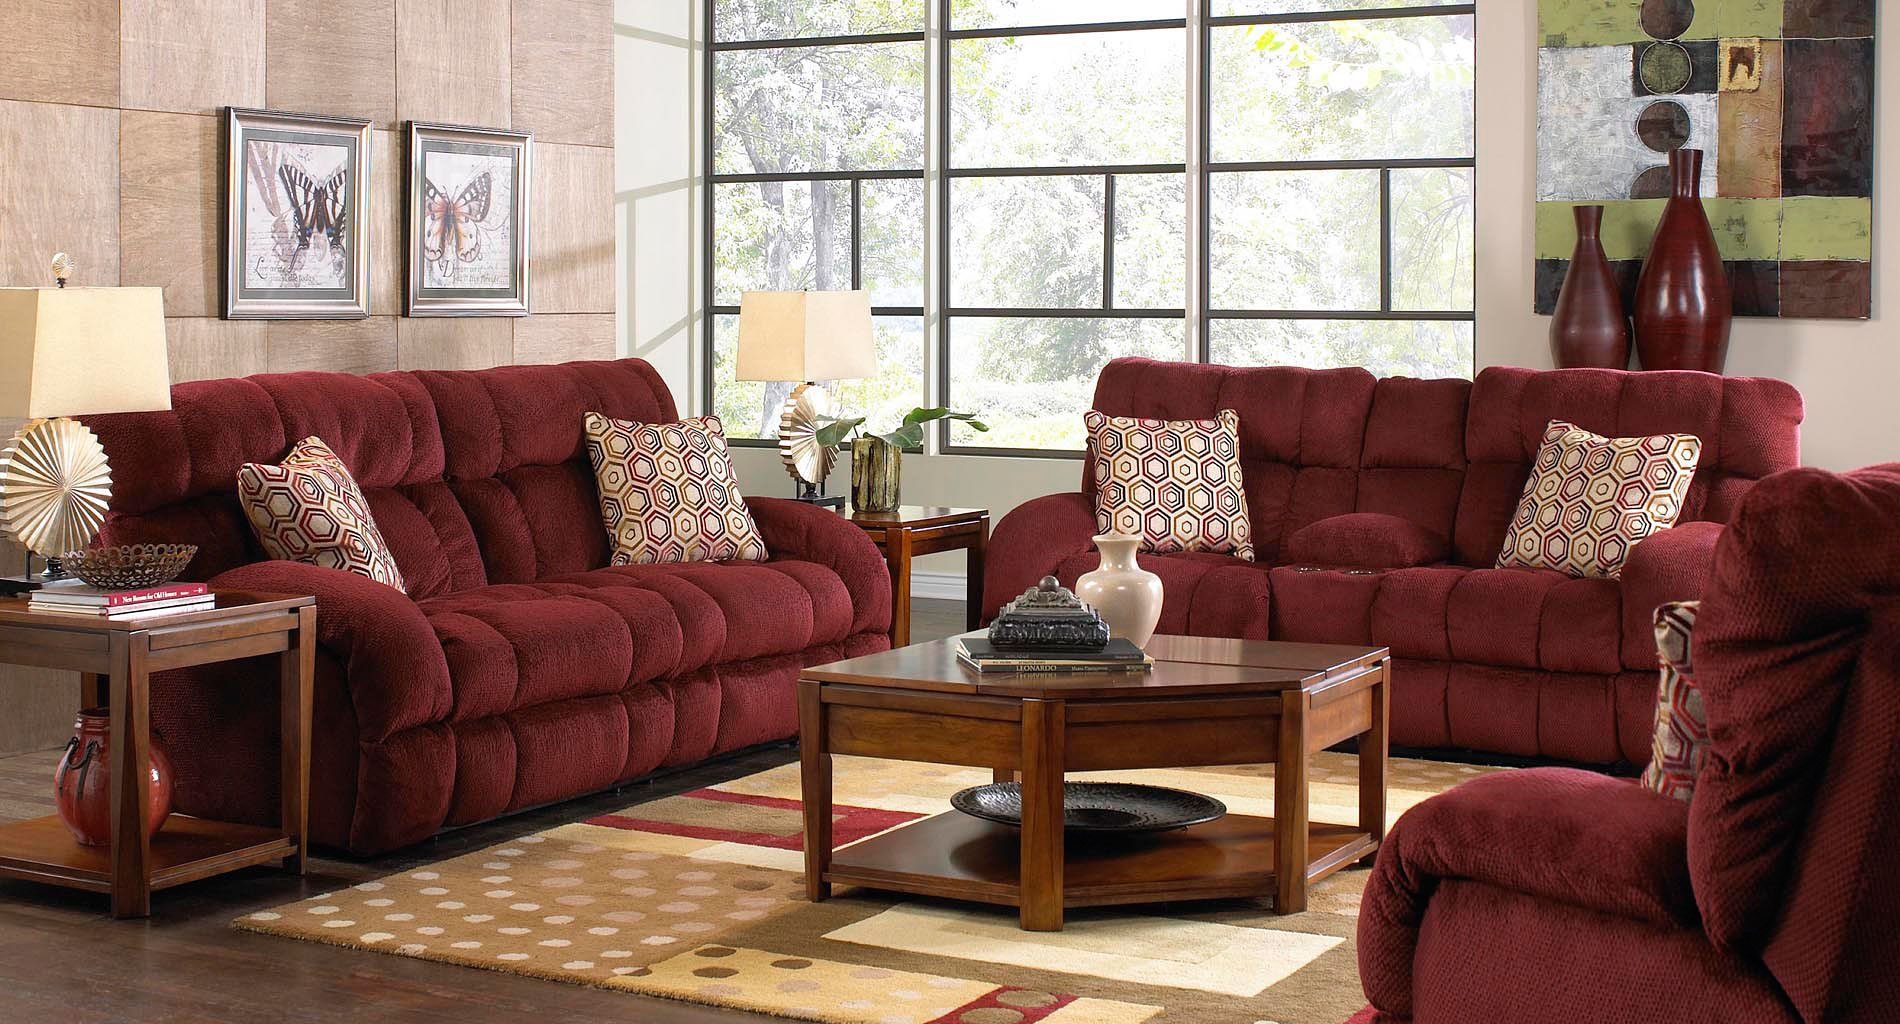 Siesta Reclining Living Room Set Wine